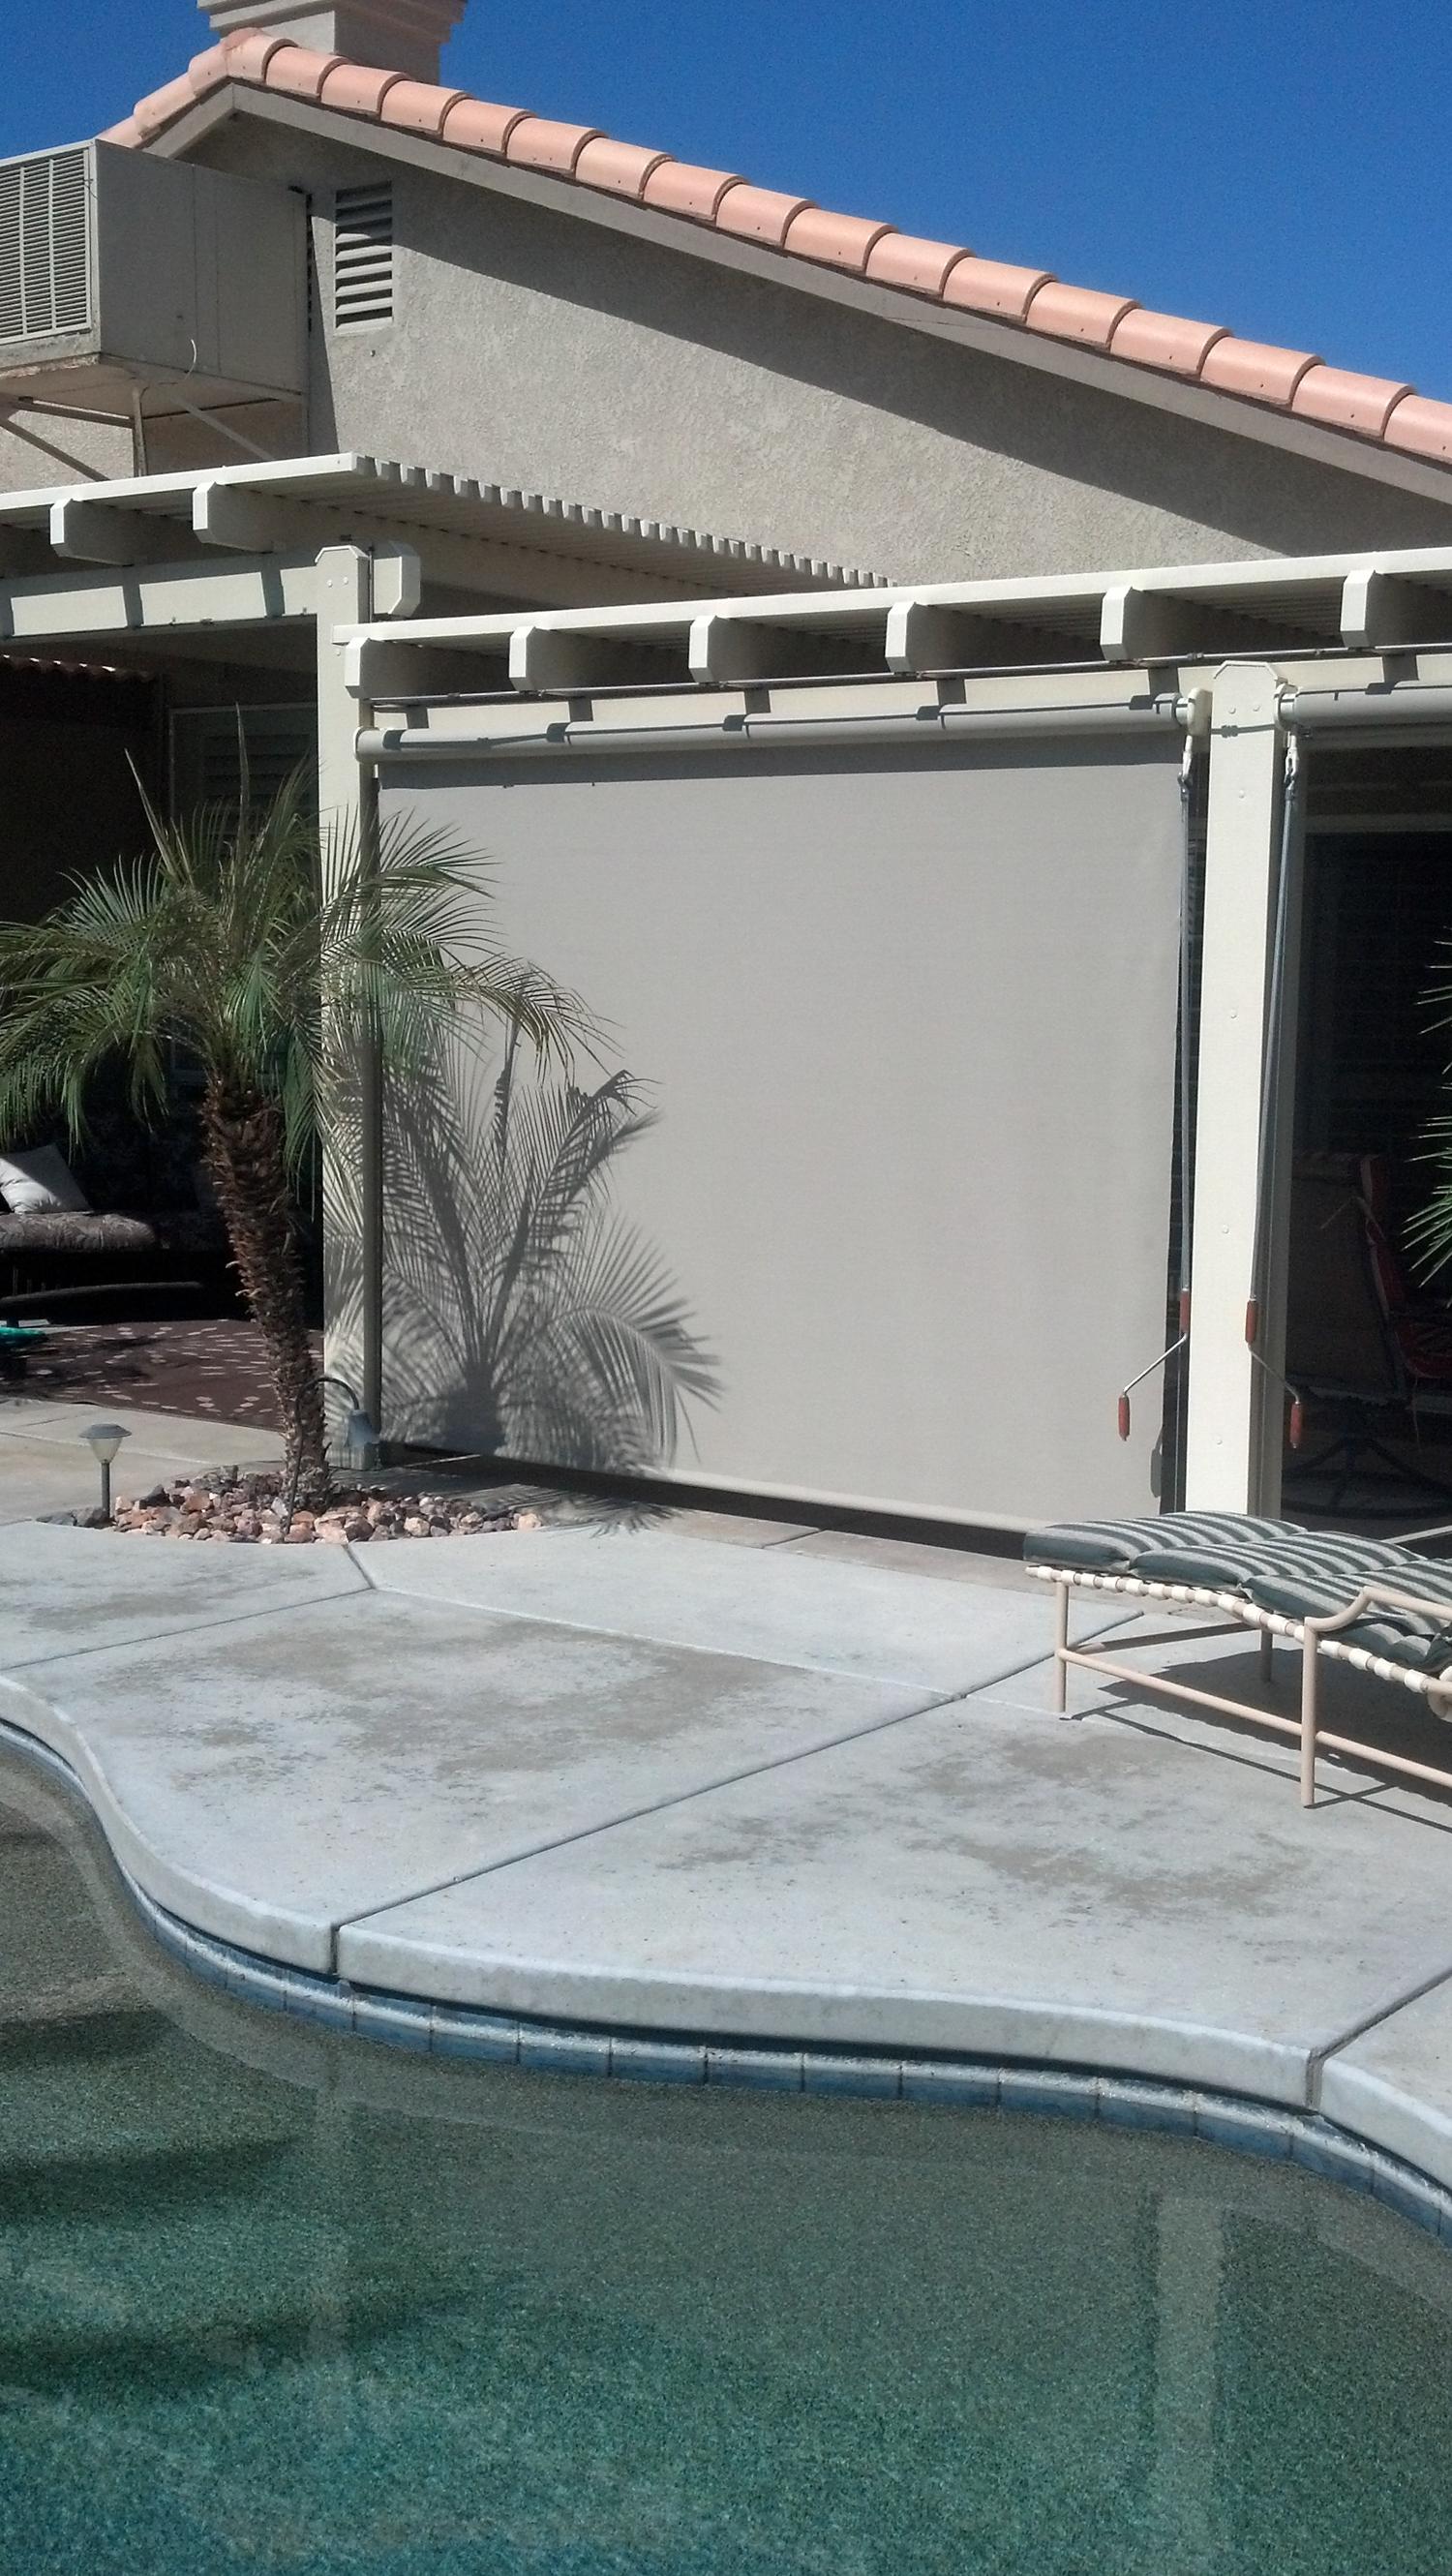 Drop Screen to Shade Outdoor Patio, Palm Desert, CA 92260